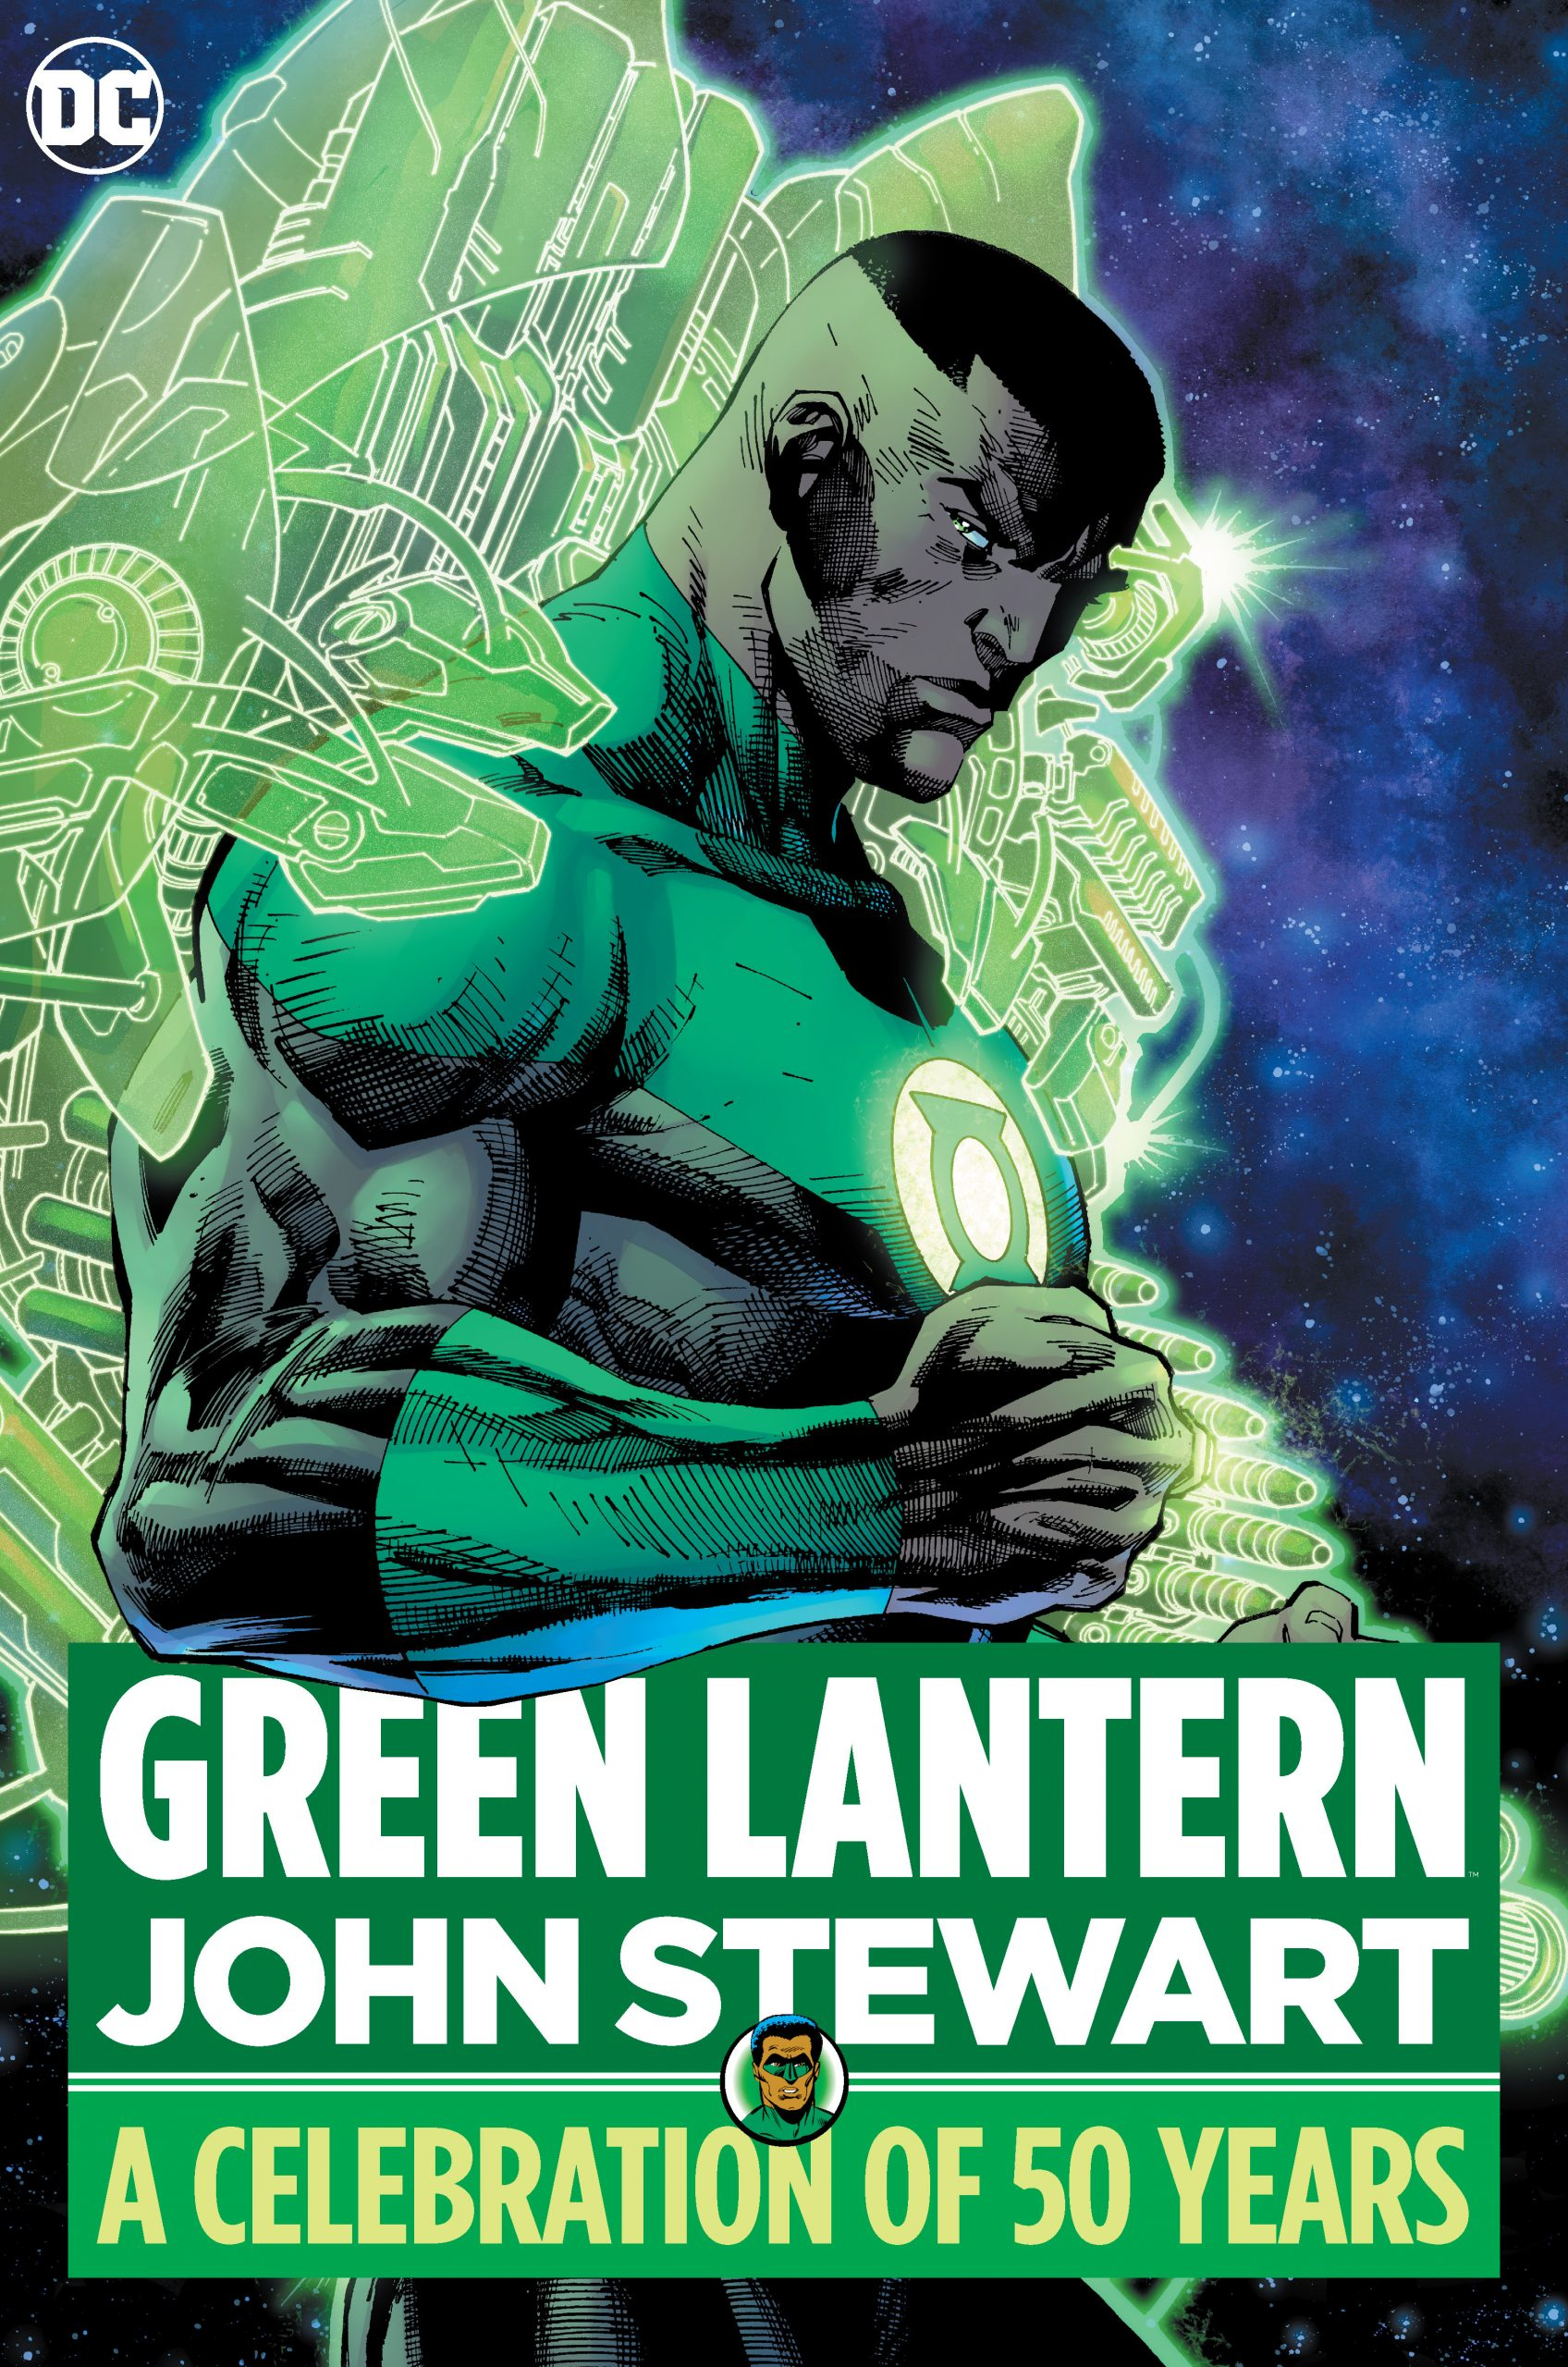 Green Lantern John Stewart - A Celebration of 50 Years